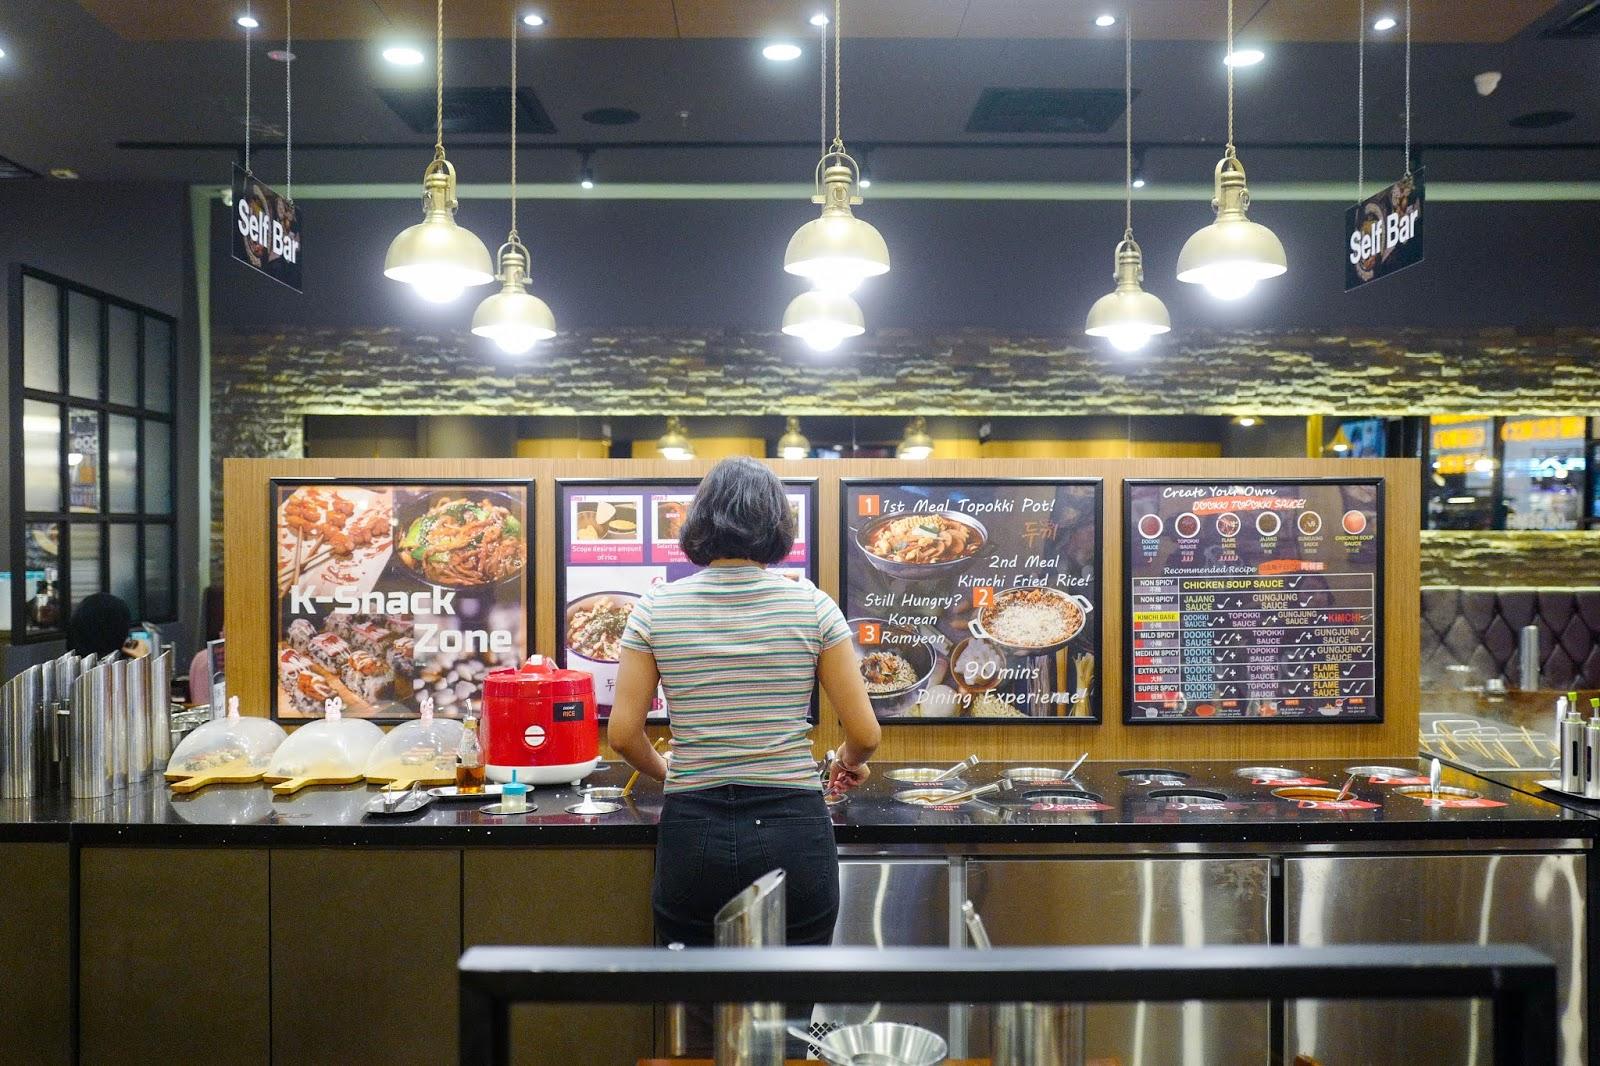 dookki korean topokki buffet, ioi city mall putrajaya & r&f mall johor bahru